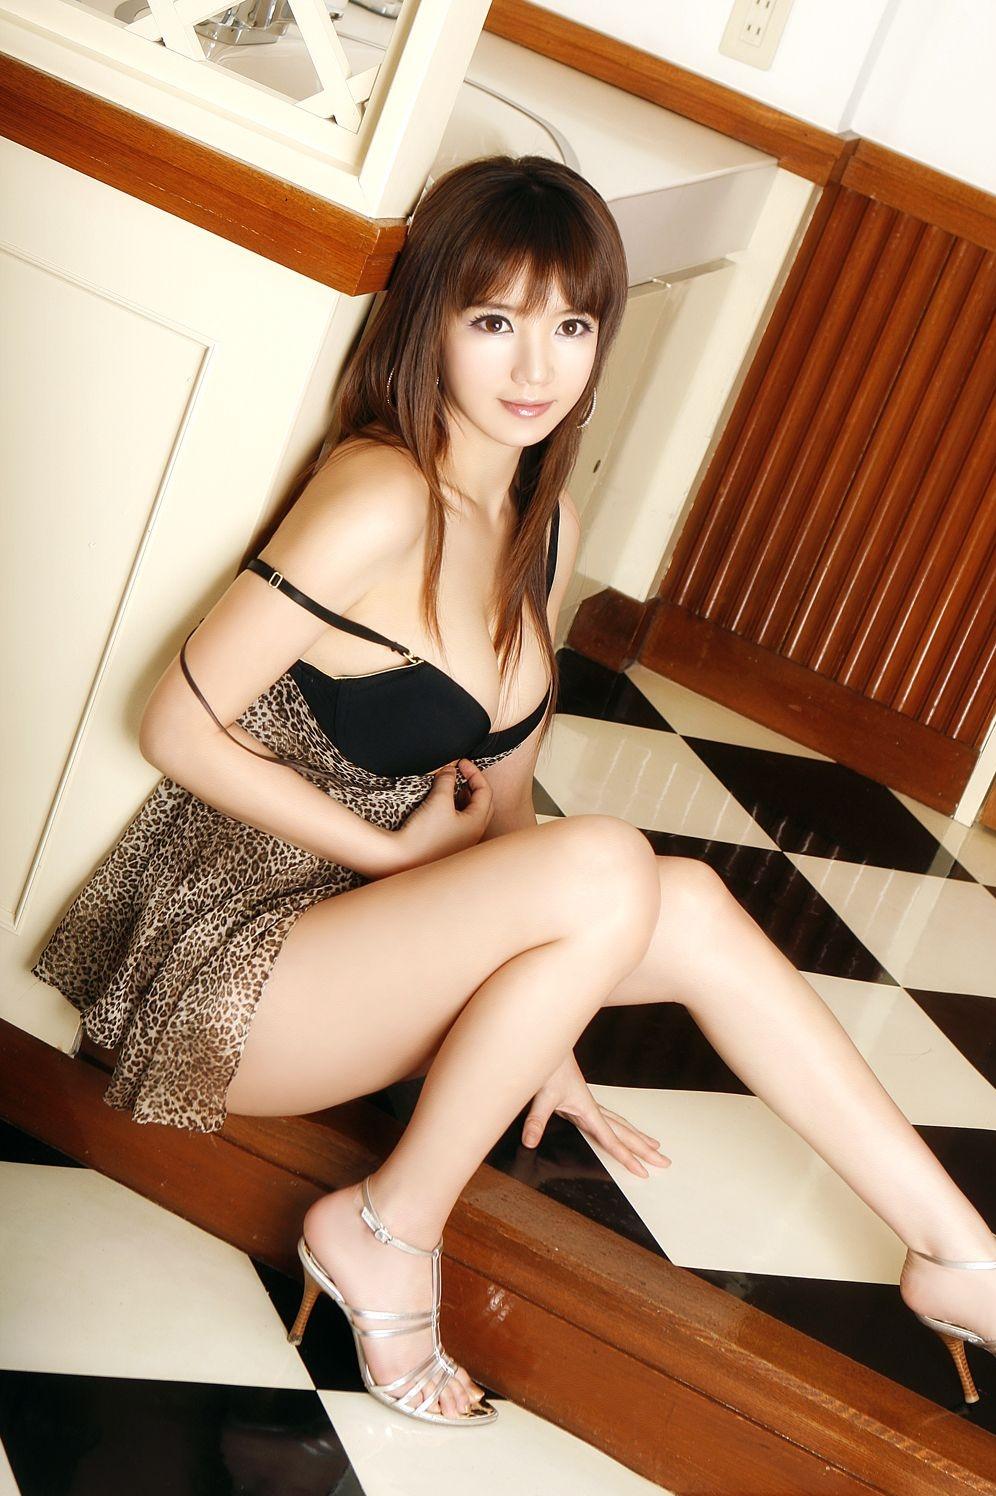 PhimVu.blogspot.com Korean Girls Epic Photoshop part 13